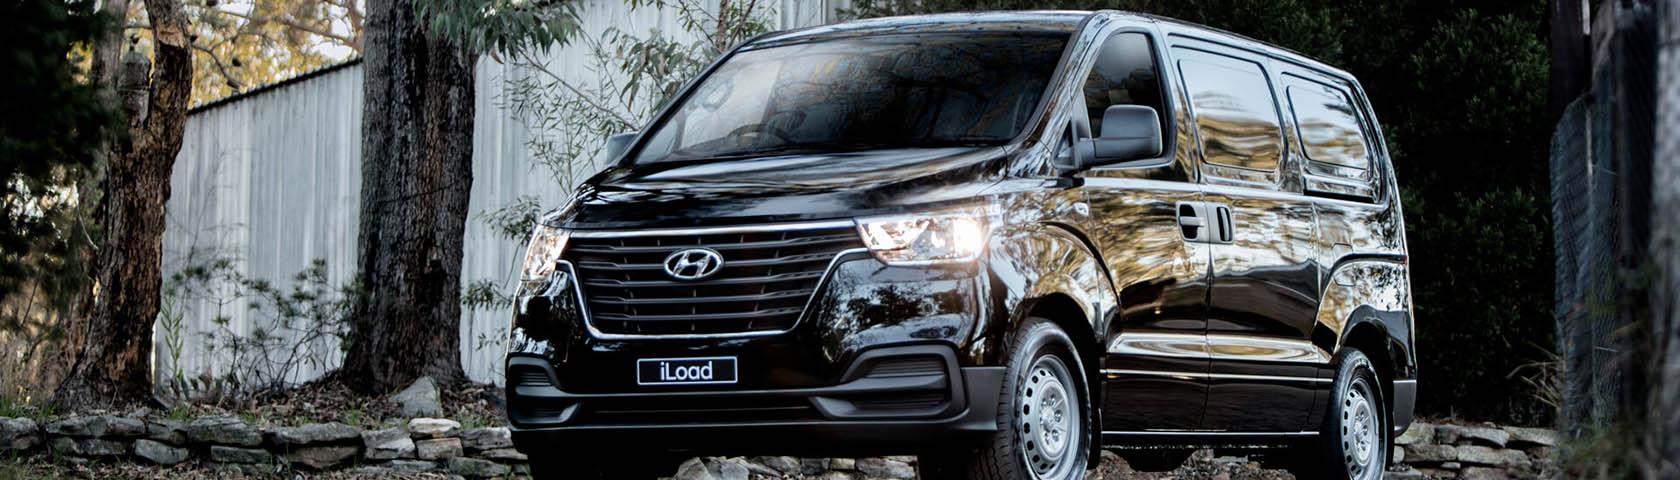 Hyundai-PB-iLoad-01